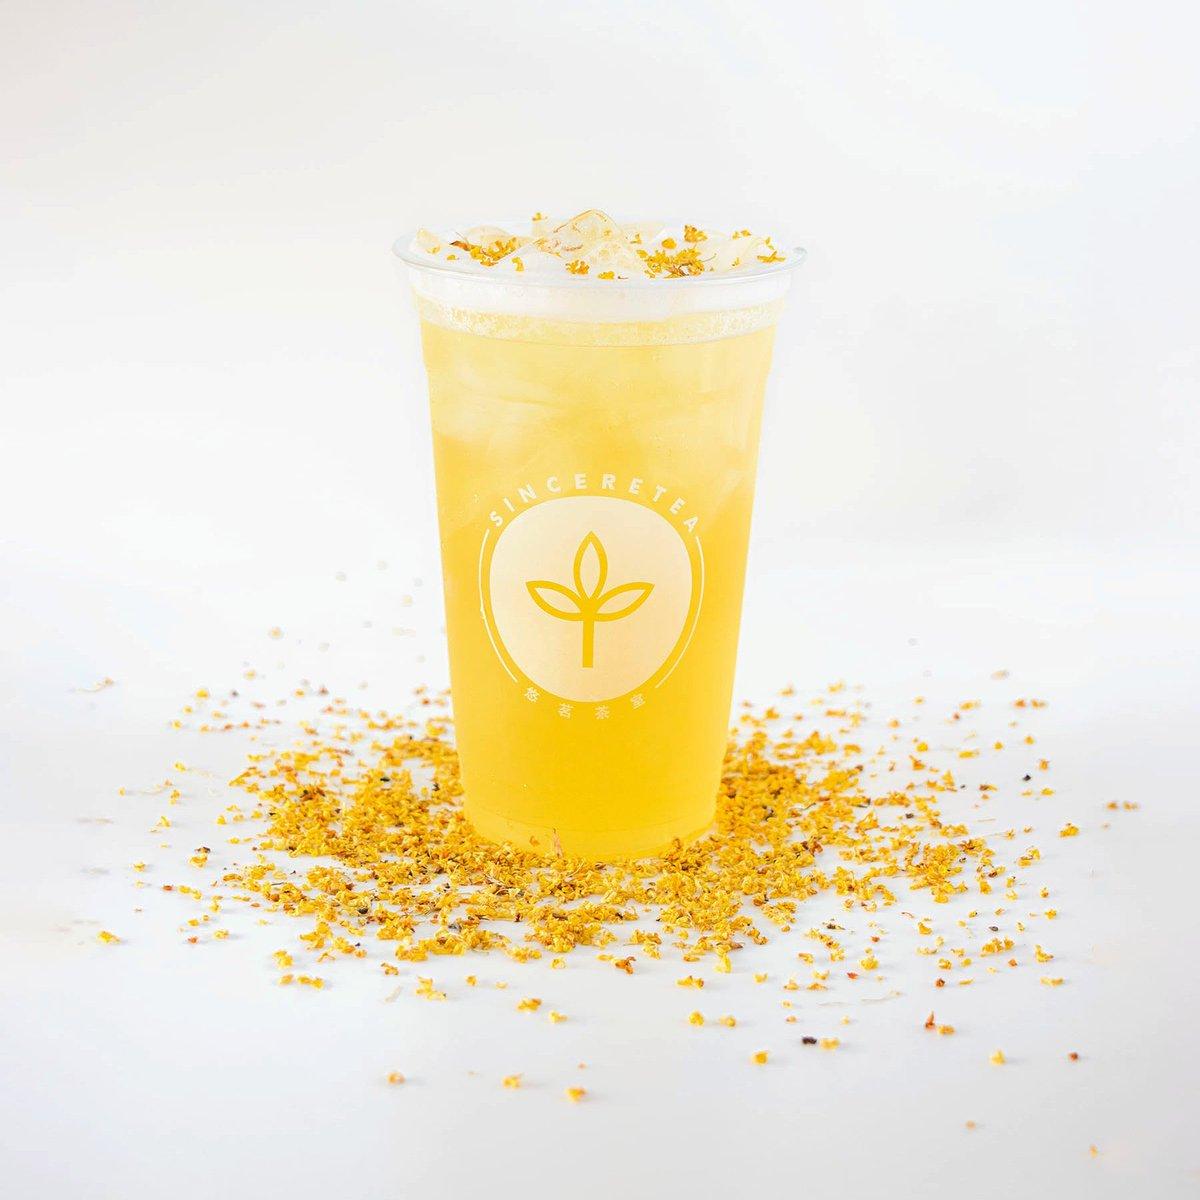 Feeling festive with our Chrysanthemum Lychee tea. . . #spring #seasonal #floral #fruittea #sweettea #sinceretea #specialtea #teaaddict #teashop #milktea #boba #bobamilktea #march #chrysanthemum #osmanthus #happinessinacup #lychee #fig #yellow #downtownwalnutcreek #downtownsjpic.twitter.com/kTf9Vzt4qd